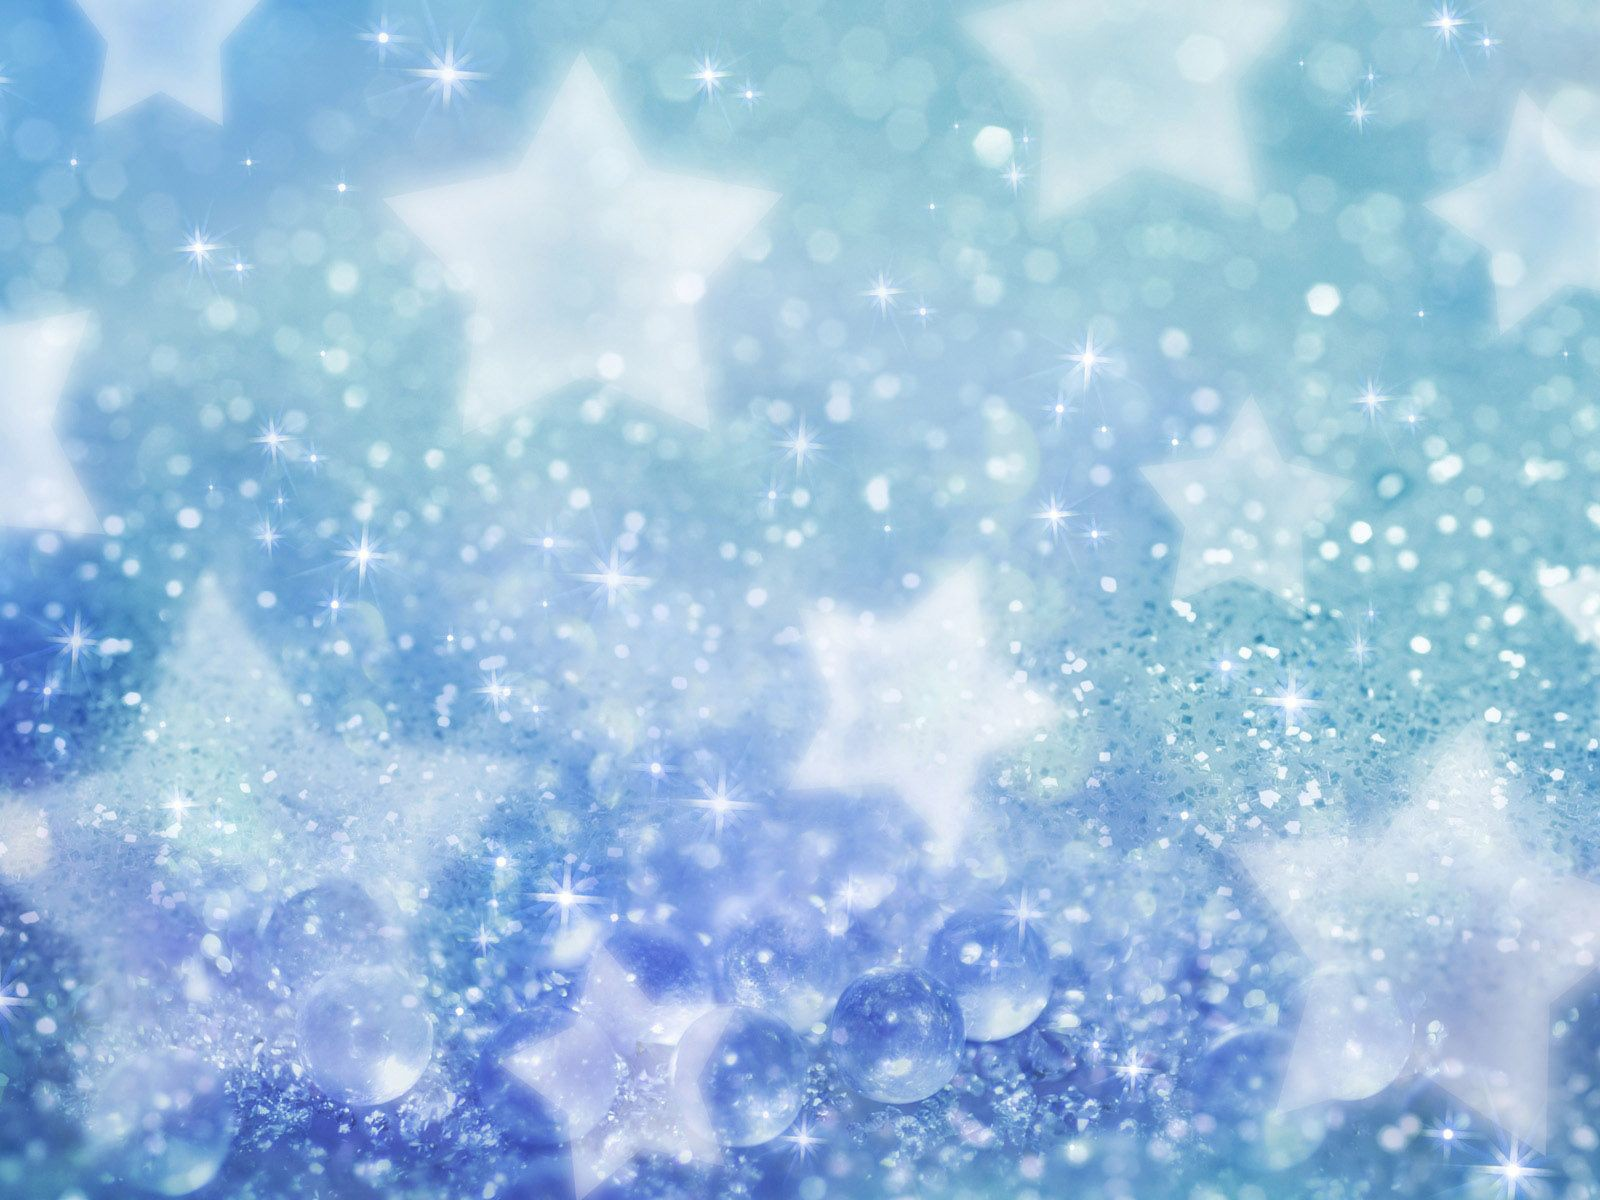 free star background 19040